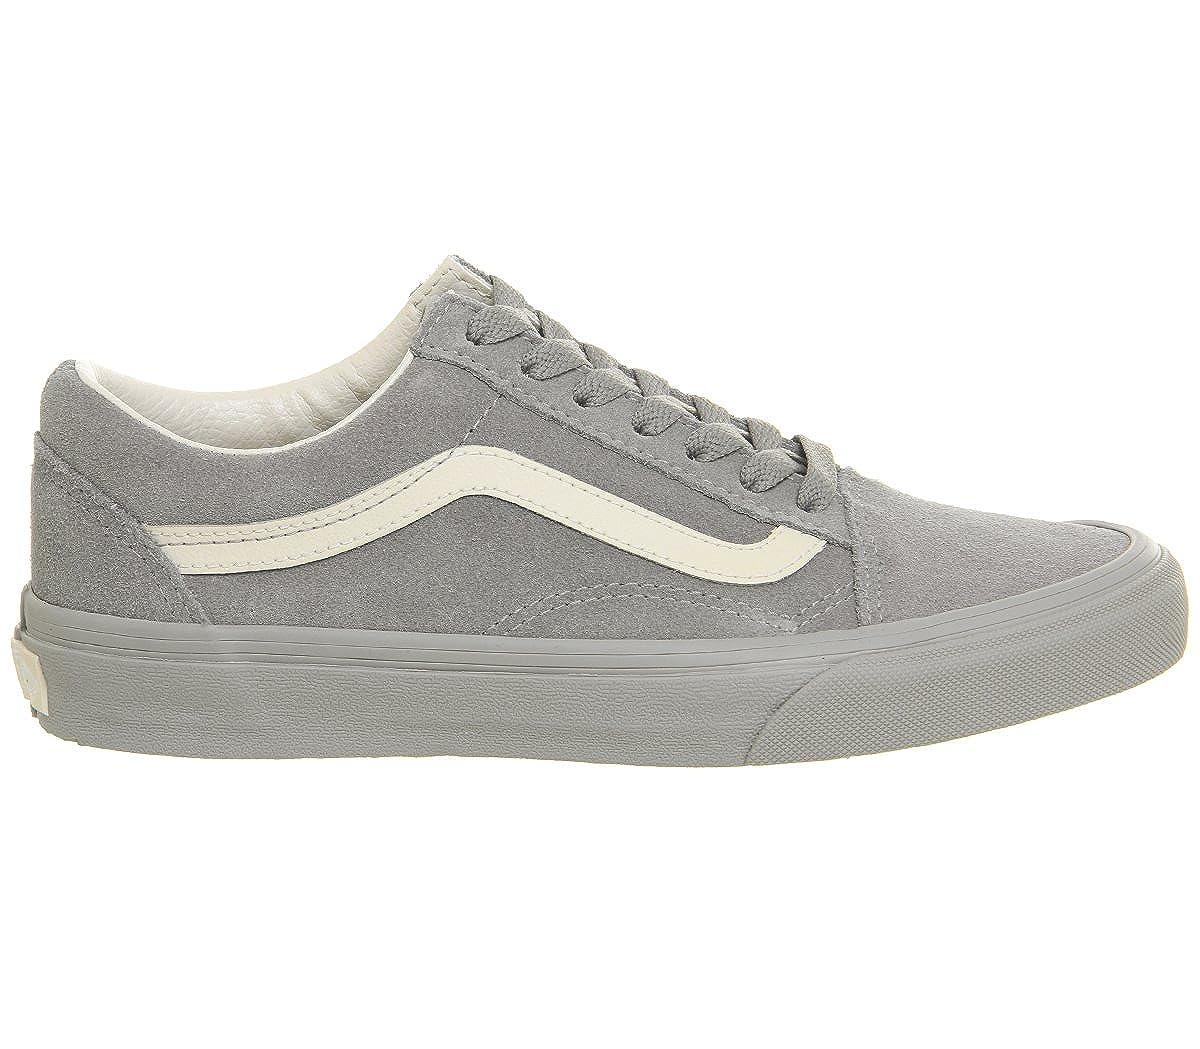 Vans Vans Vans Classic, Unisex - Kinder Sportschuhe - Skateboarding  2211fc